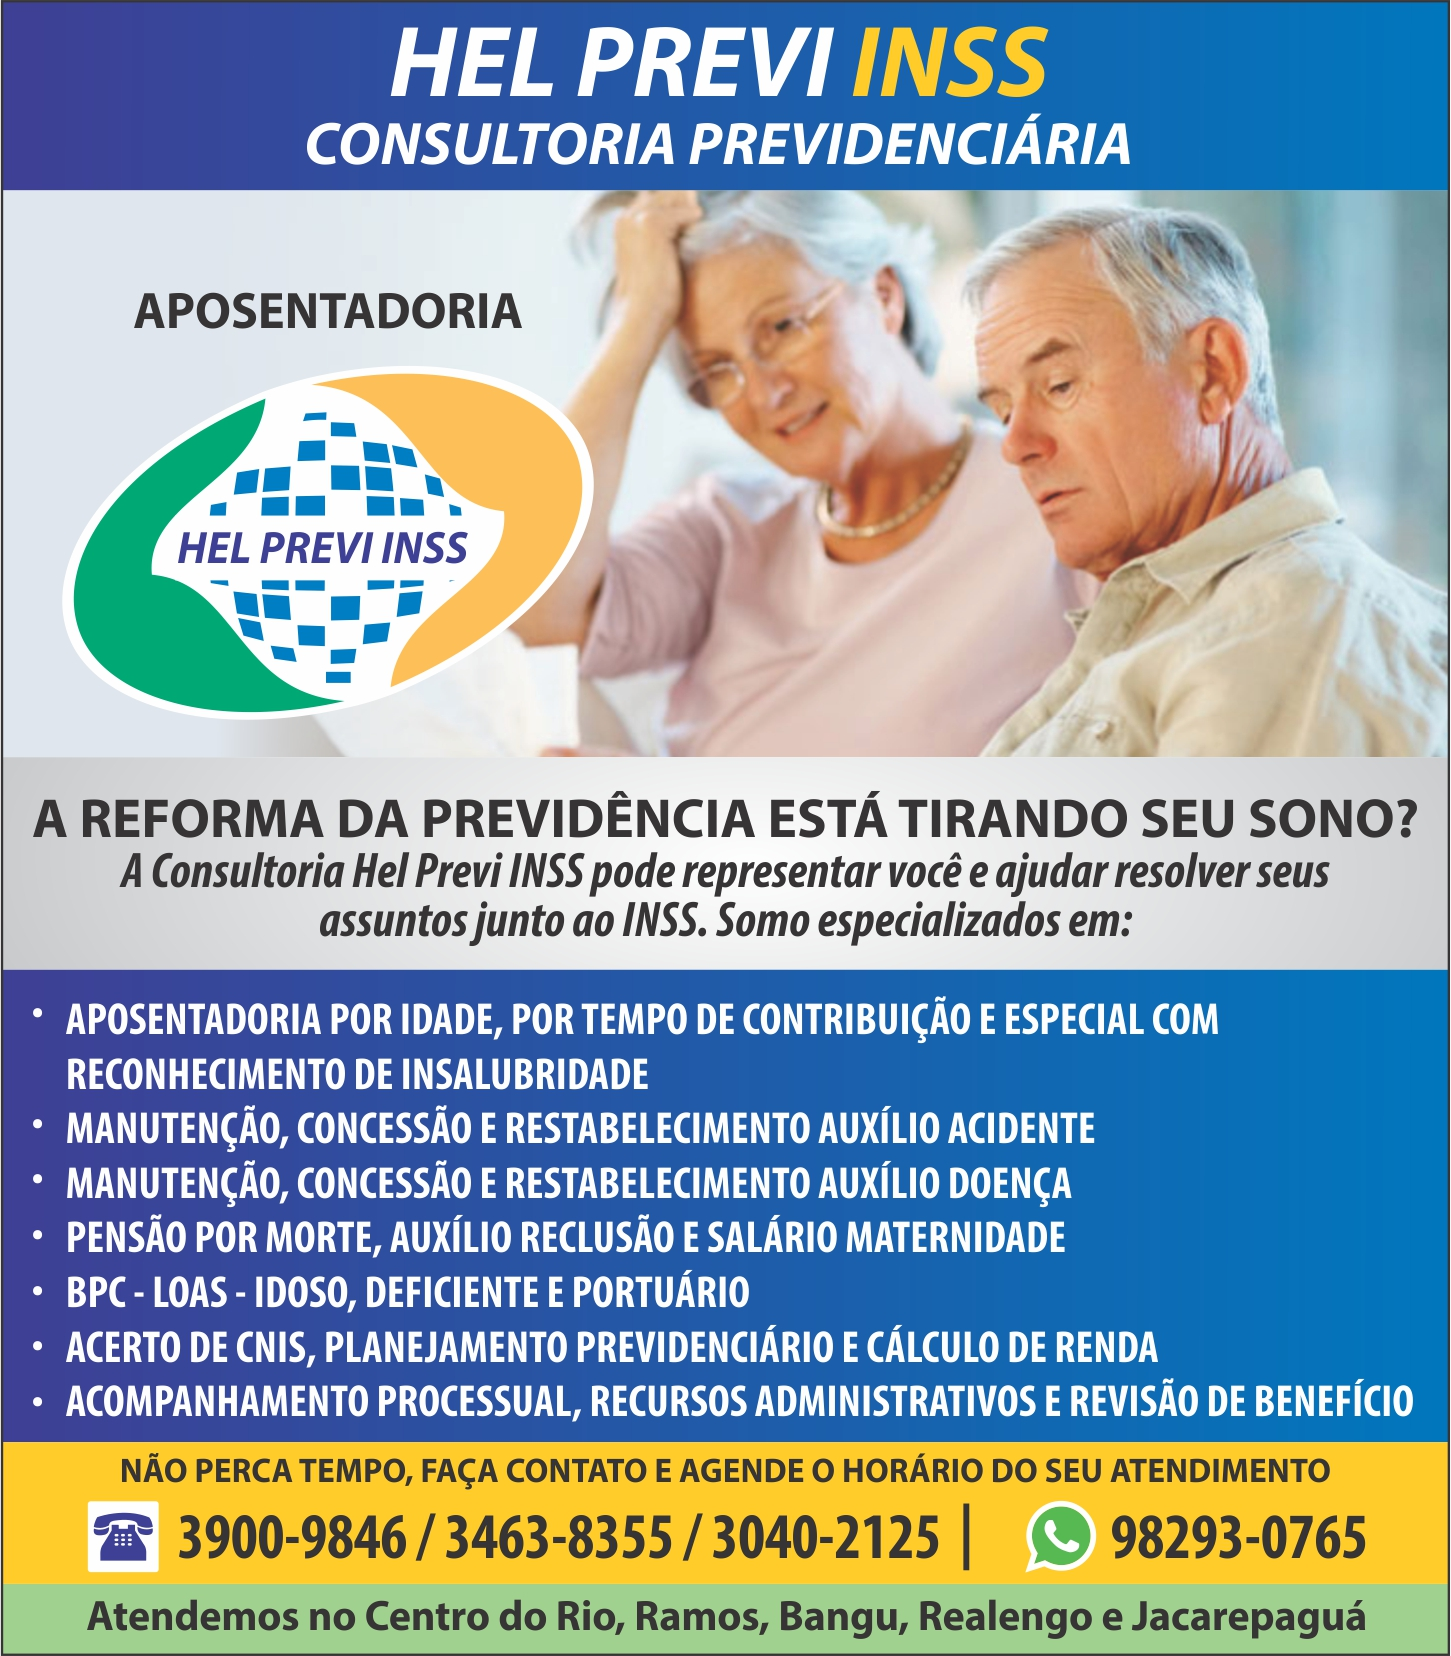 REBS Promotoria Previ INSS